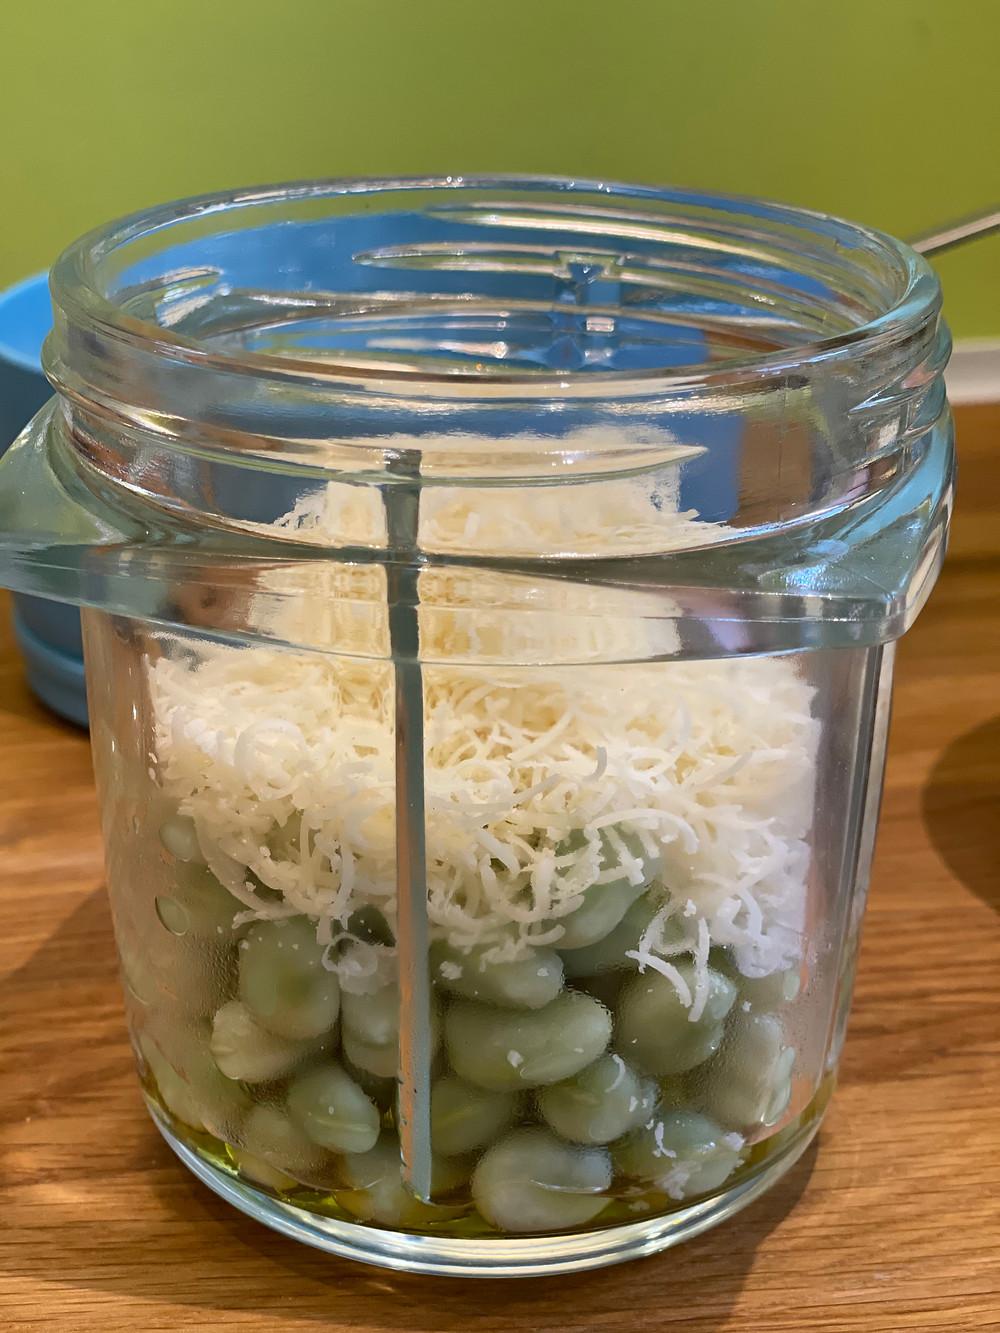 fève, parmesan padano, huile d'olive, blender